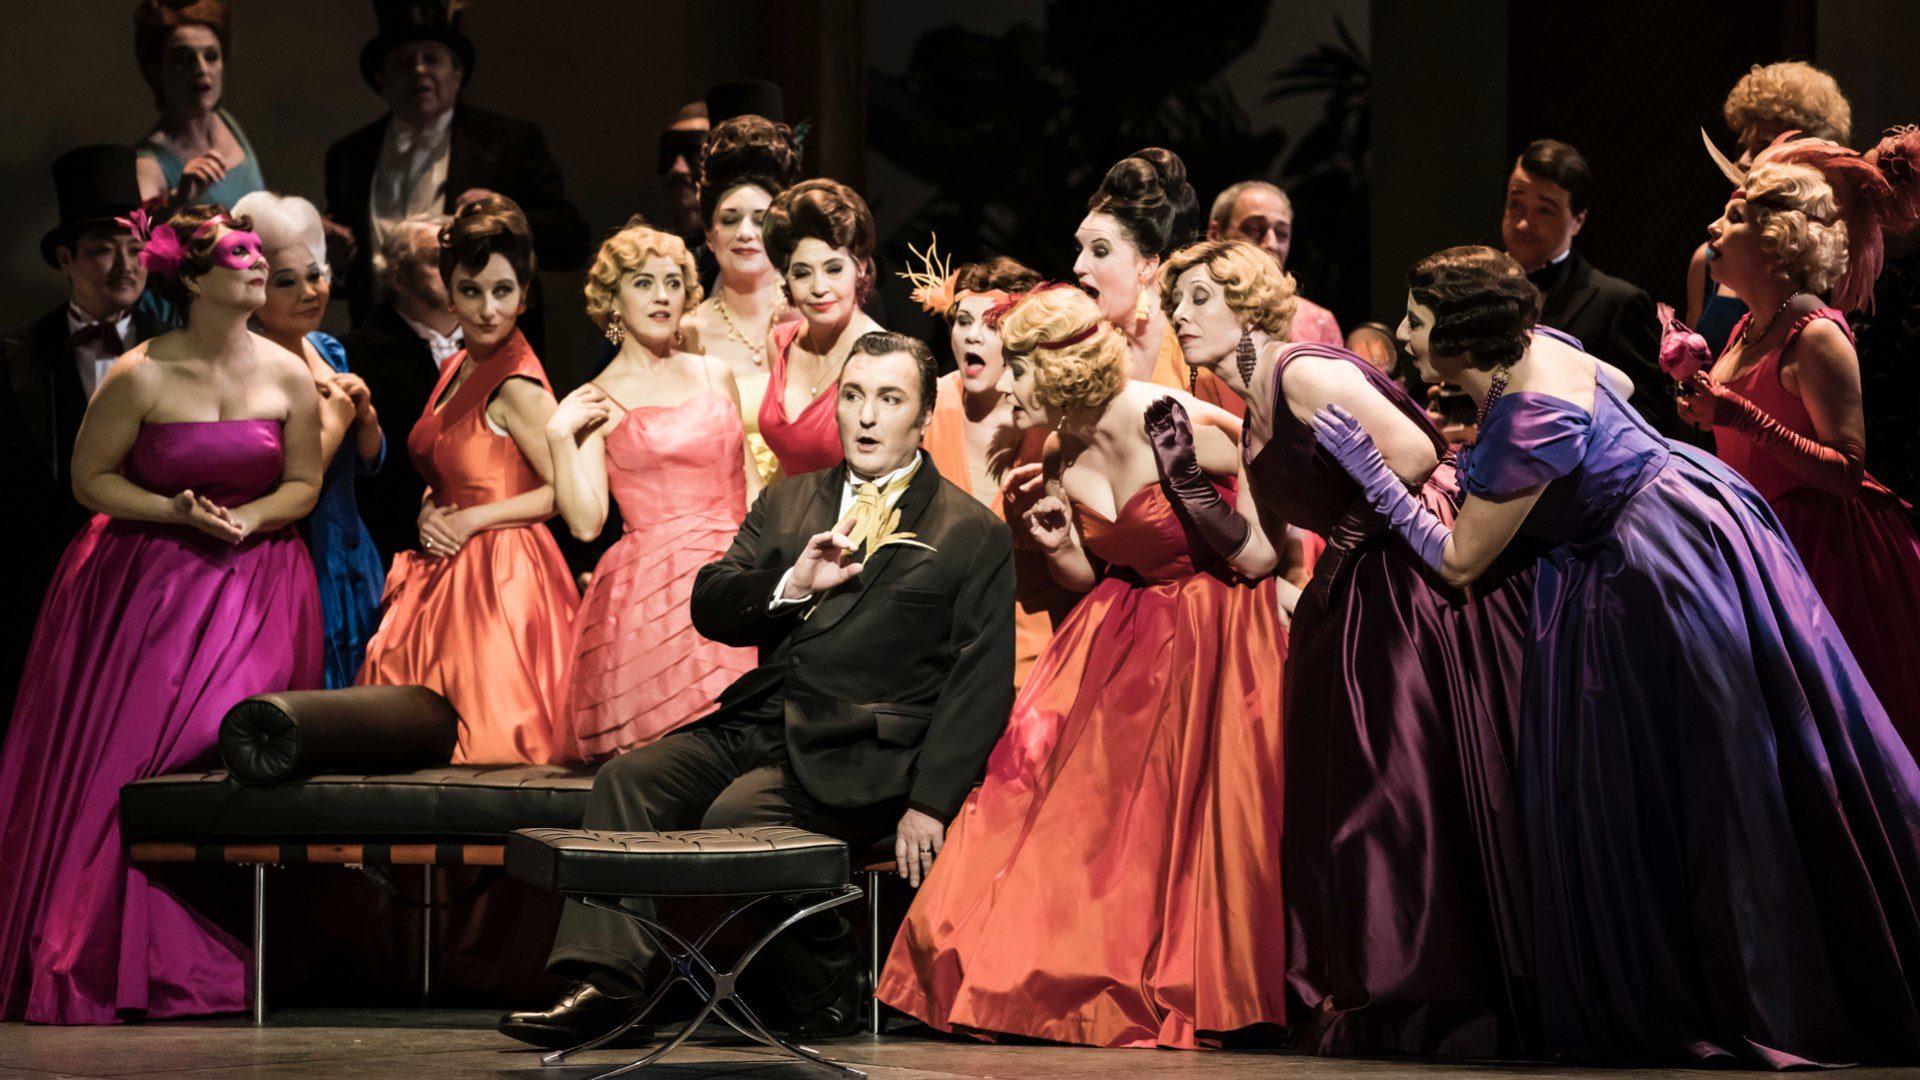 Oopperat, baletit ja konsertit